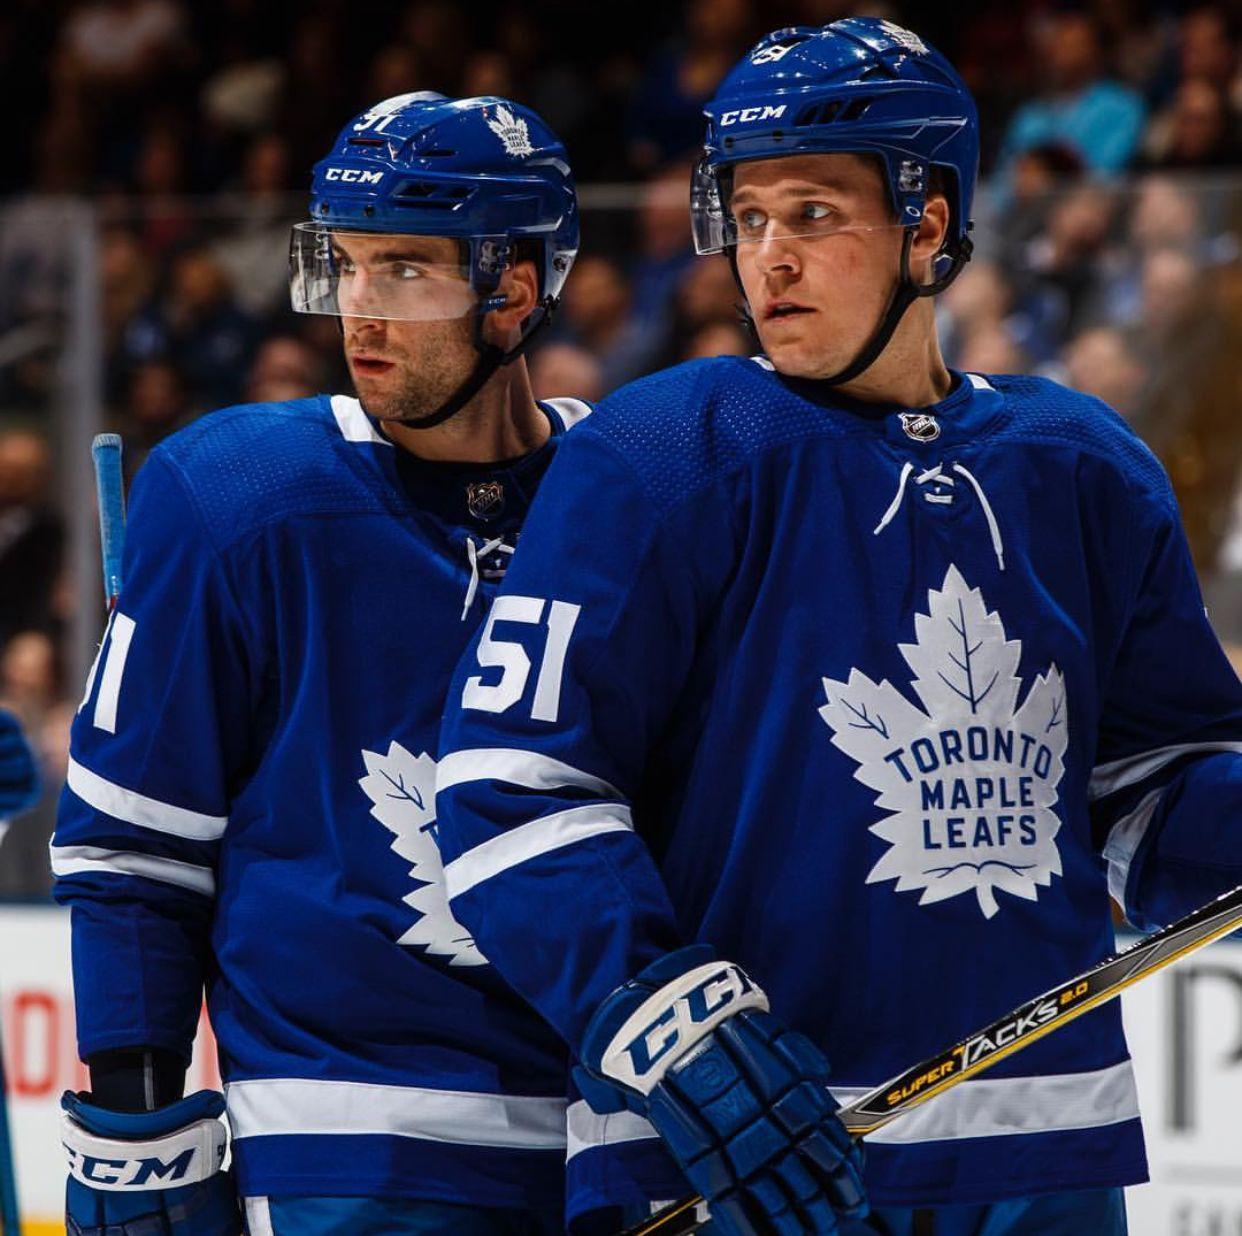 7c149459c ... Toronto Maple Leafs by DL. John Tavares • Jake Gardiner